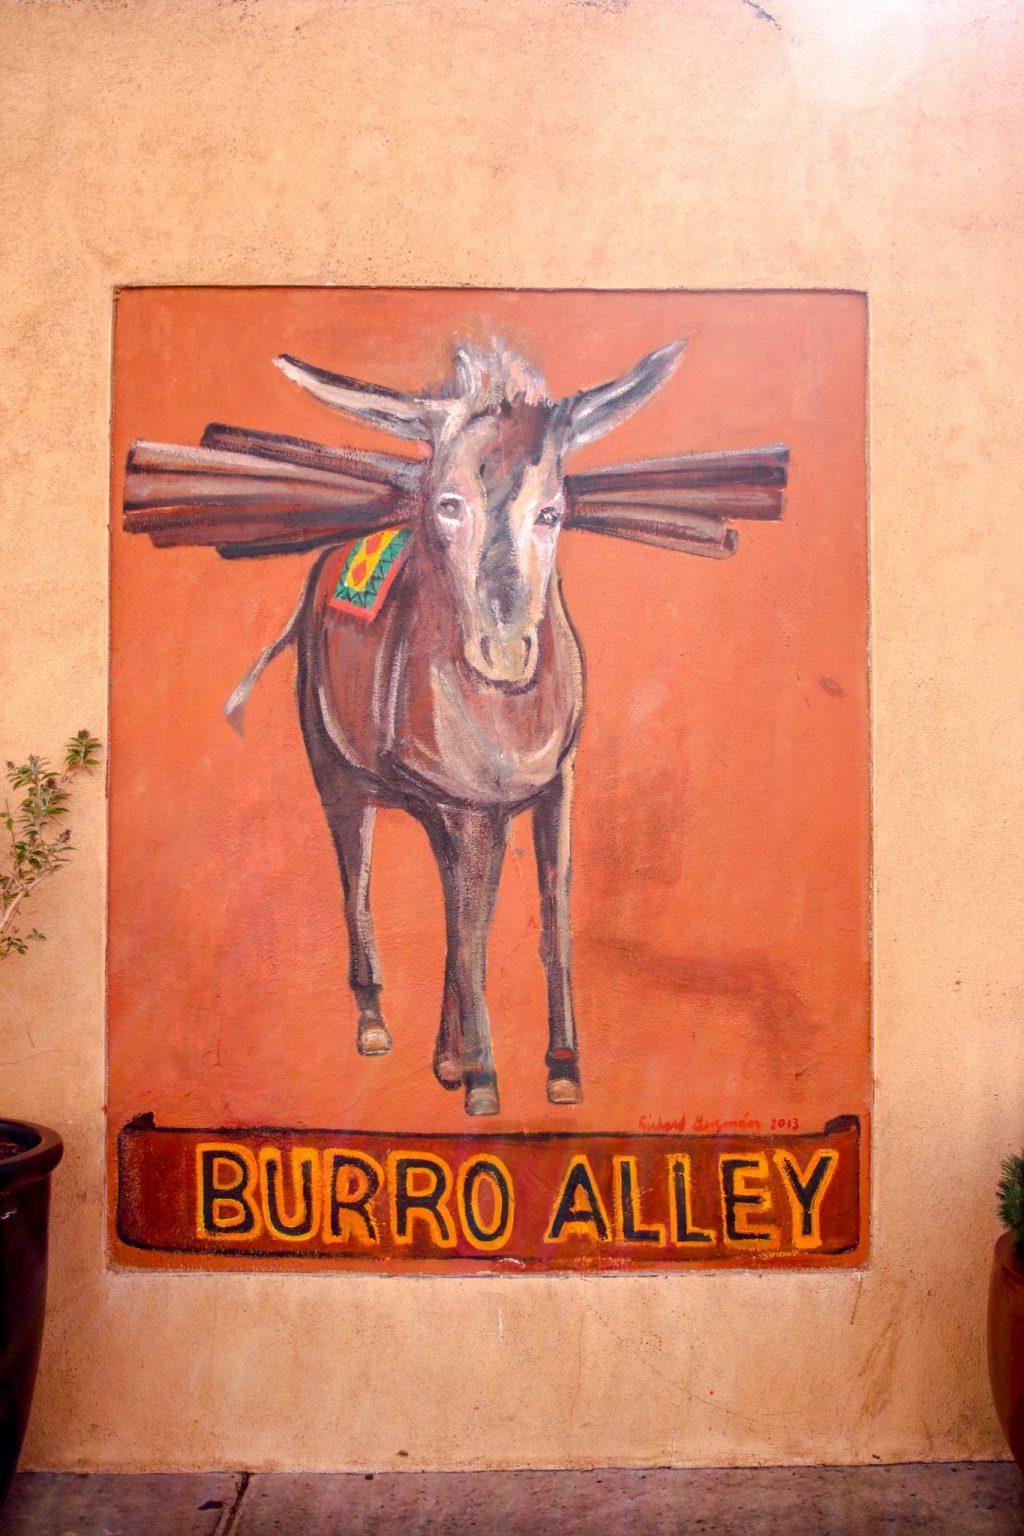 Burro Alley Santa Fe New Mexico